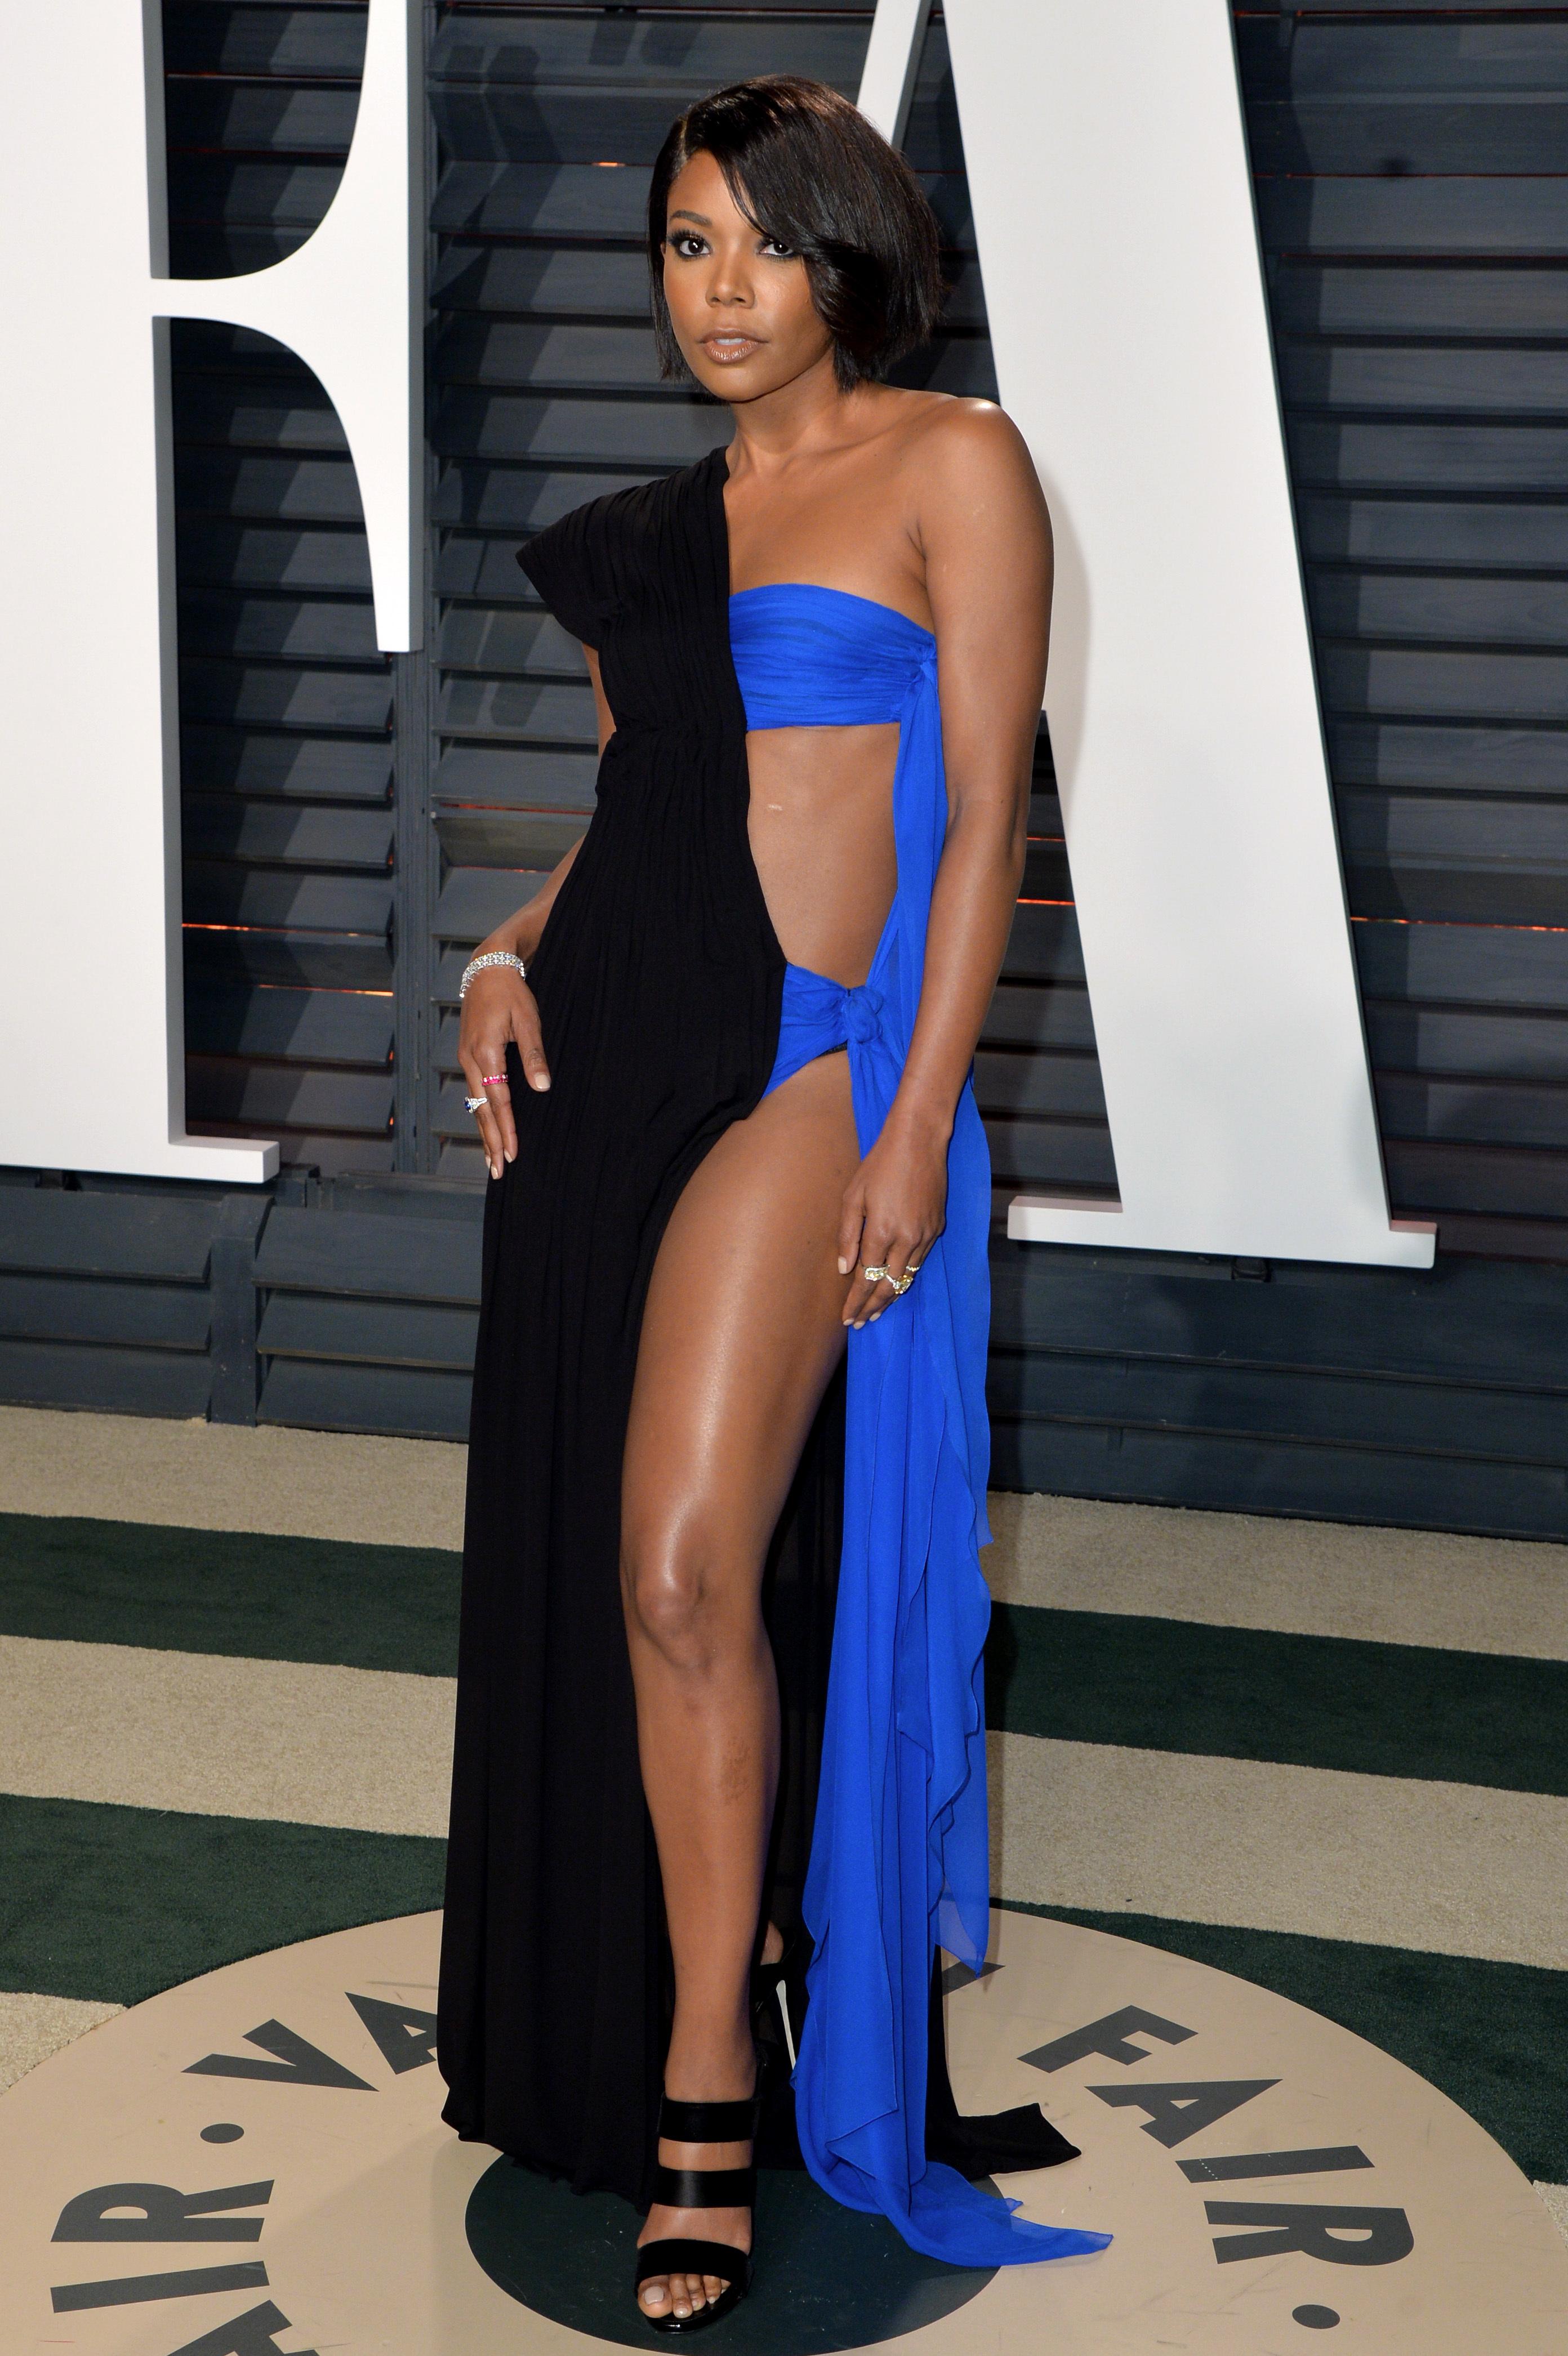 Feet Gabrielle Monique Union Wade nude (42 photos), Ass, Hot, Boobs, underwear 2015